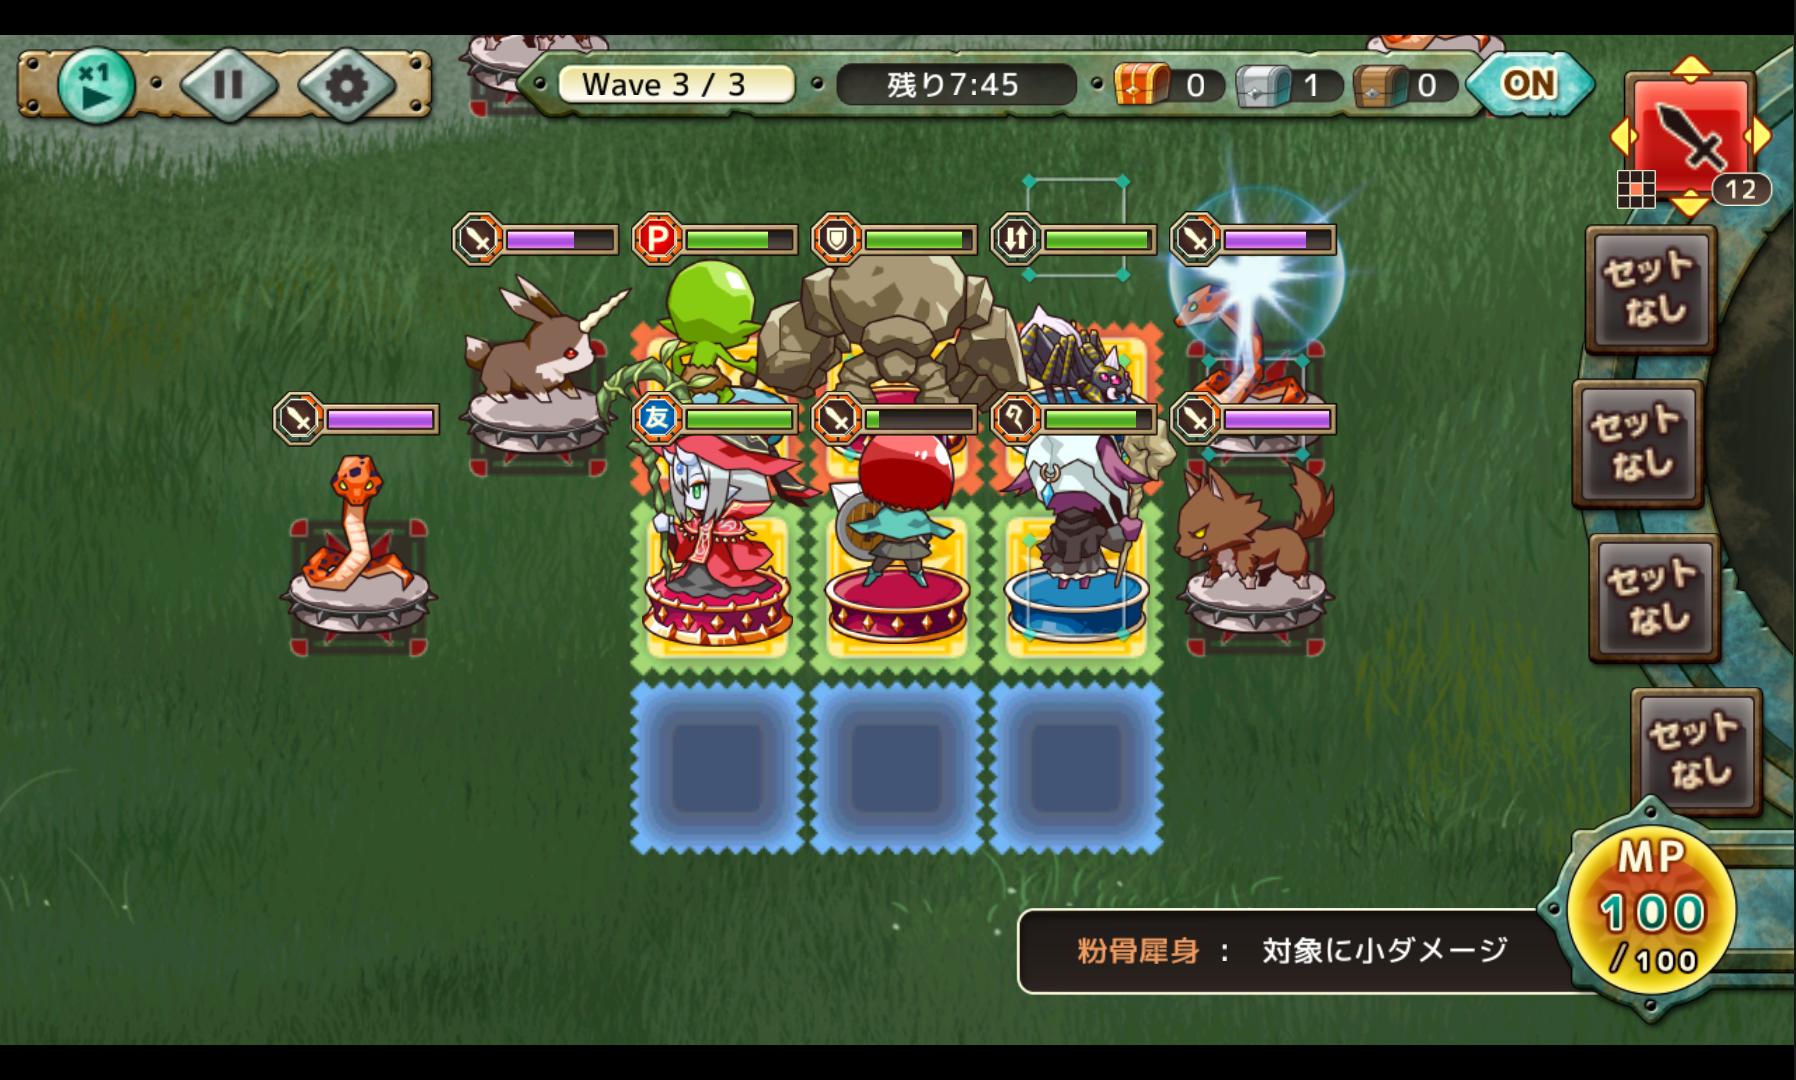 androidアプリ Re:Monster(リ・モンスター)〜ゴブリン転生記〜攻略スクリーンショット6